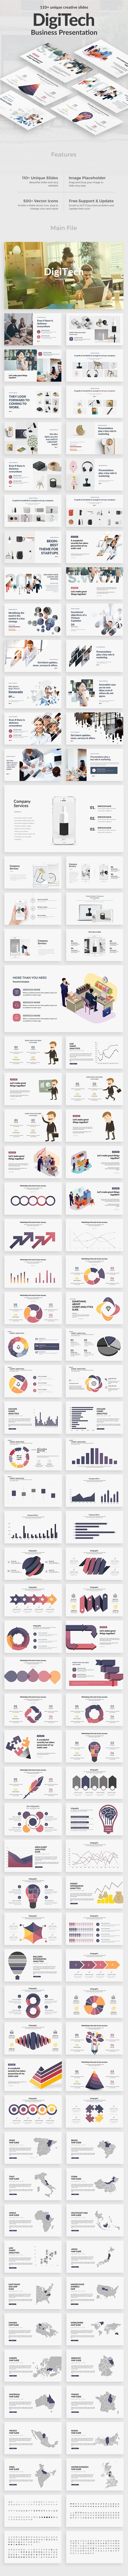 DigiTech Multipurpose Google Slide Template - Google Slides Presentation Templates